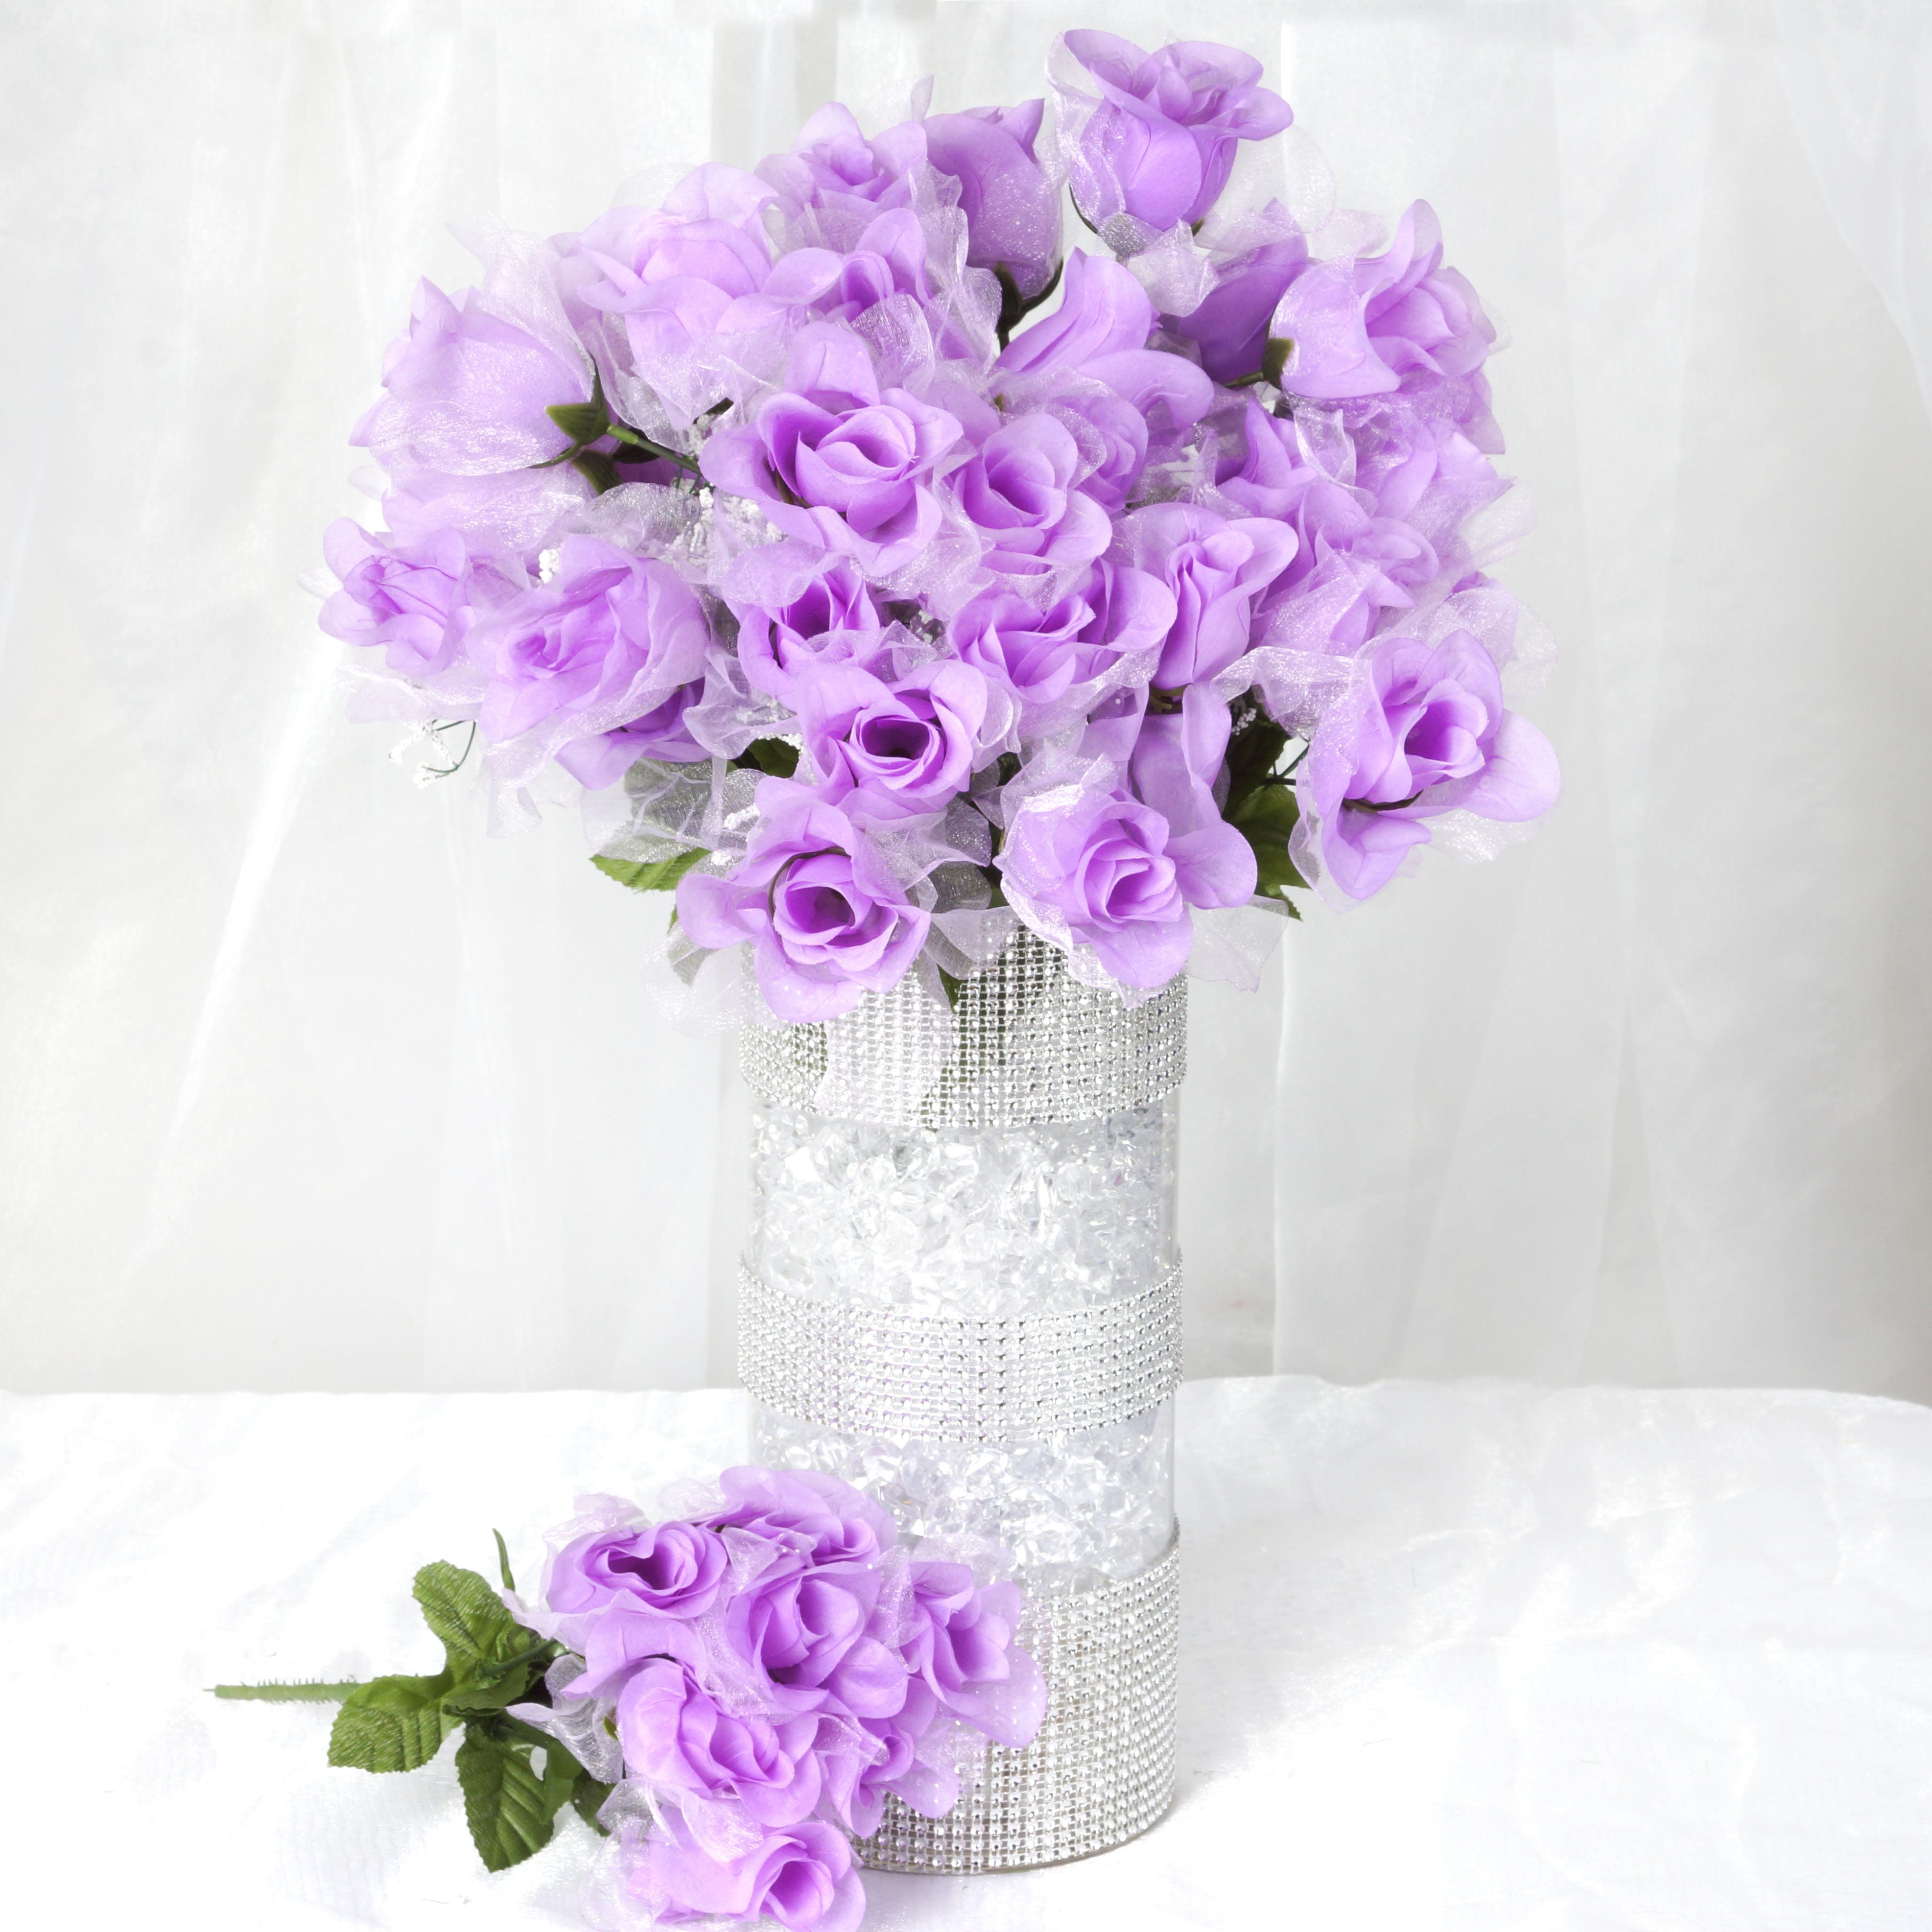 Efavormart 252 Organza Rose Artificial Buds for DIY Wedding Bouquets Centerpieces Arrangements Home Decorations Wholesale Supplies